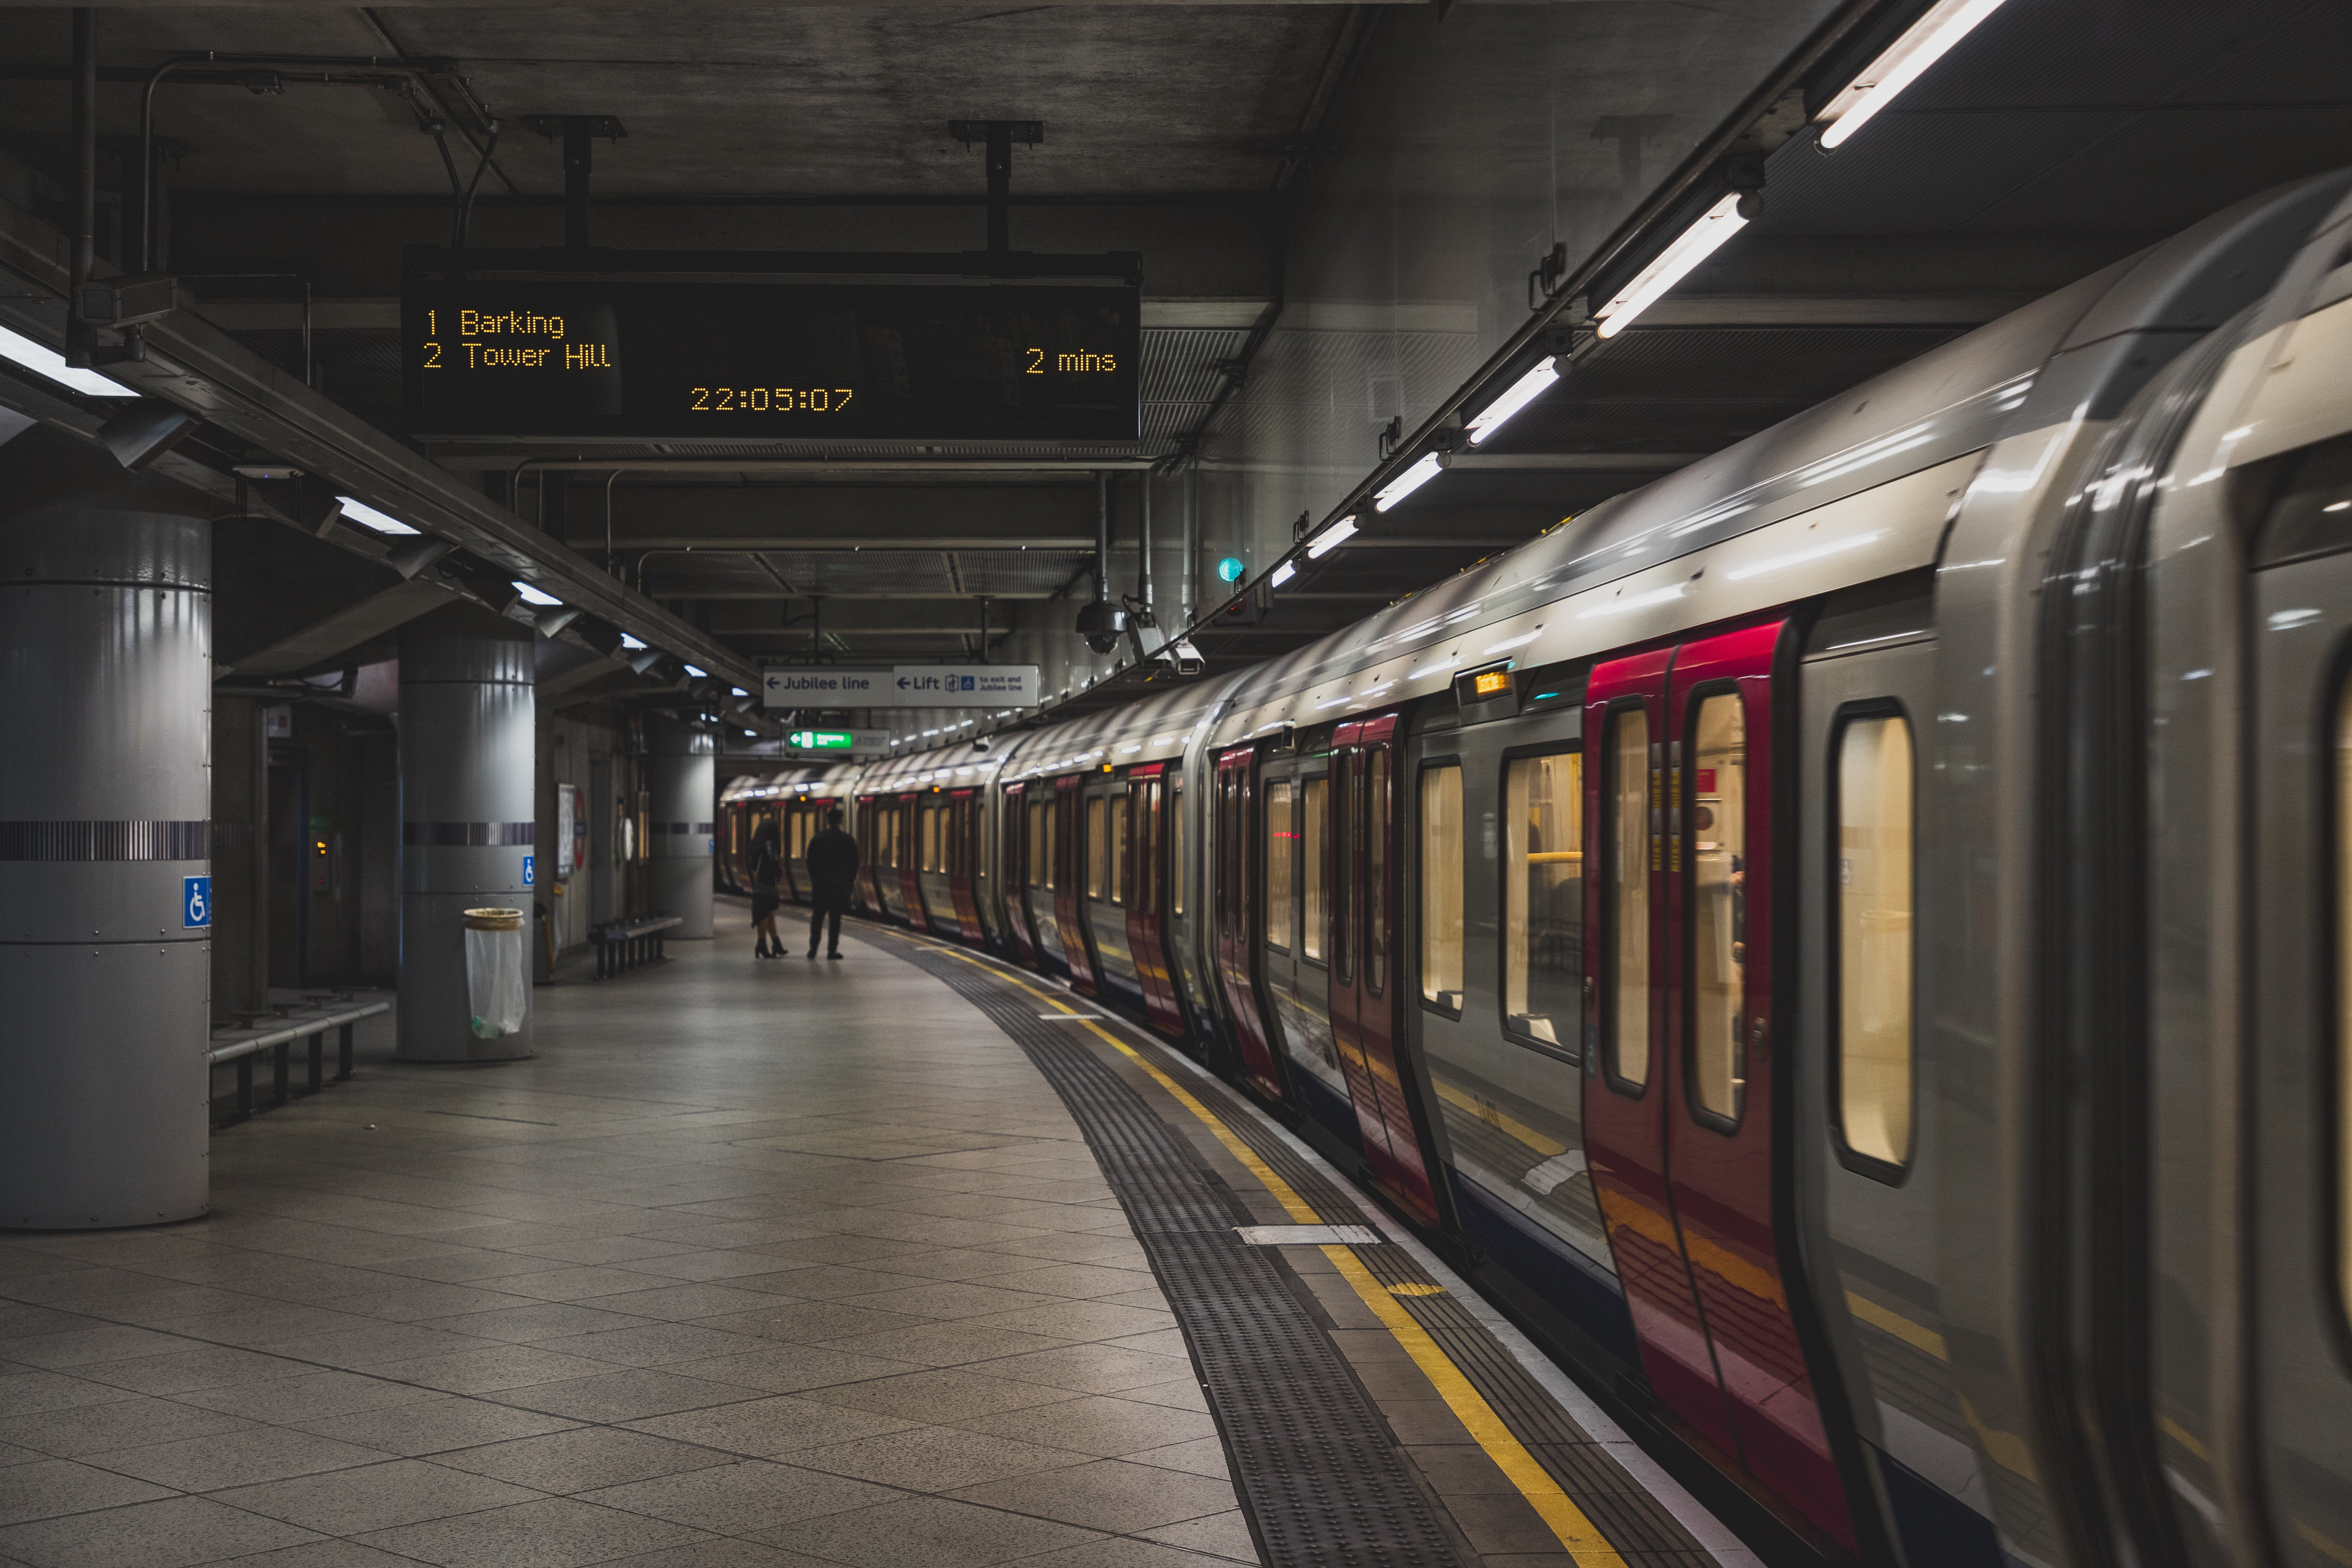 Transportation Hub: Train Station